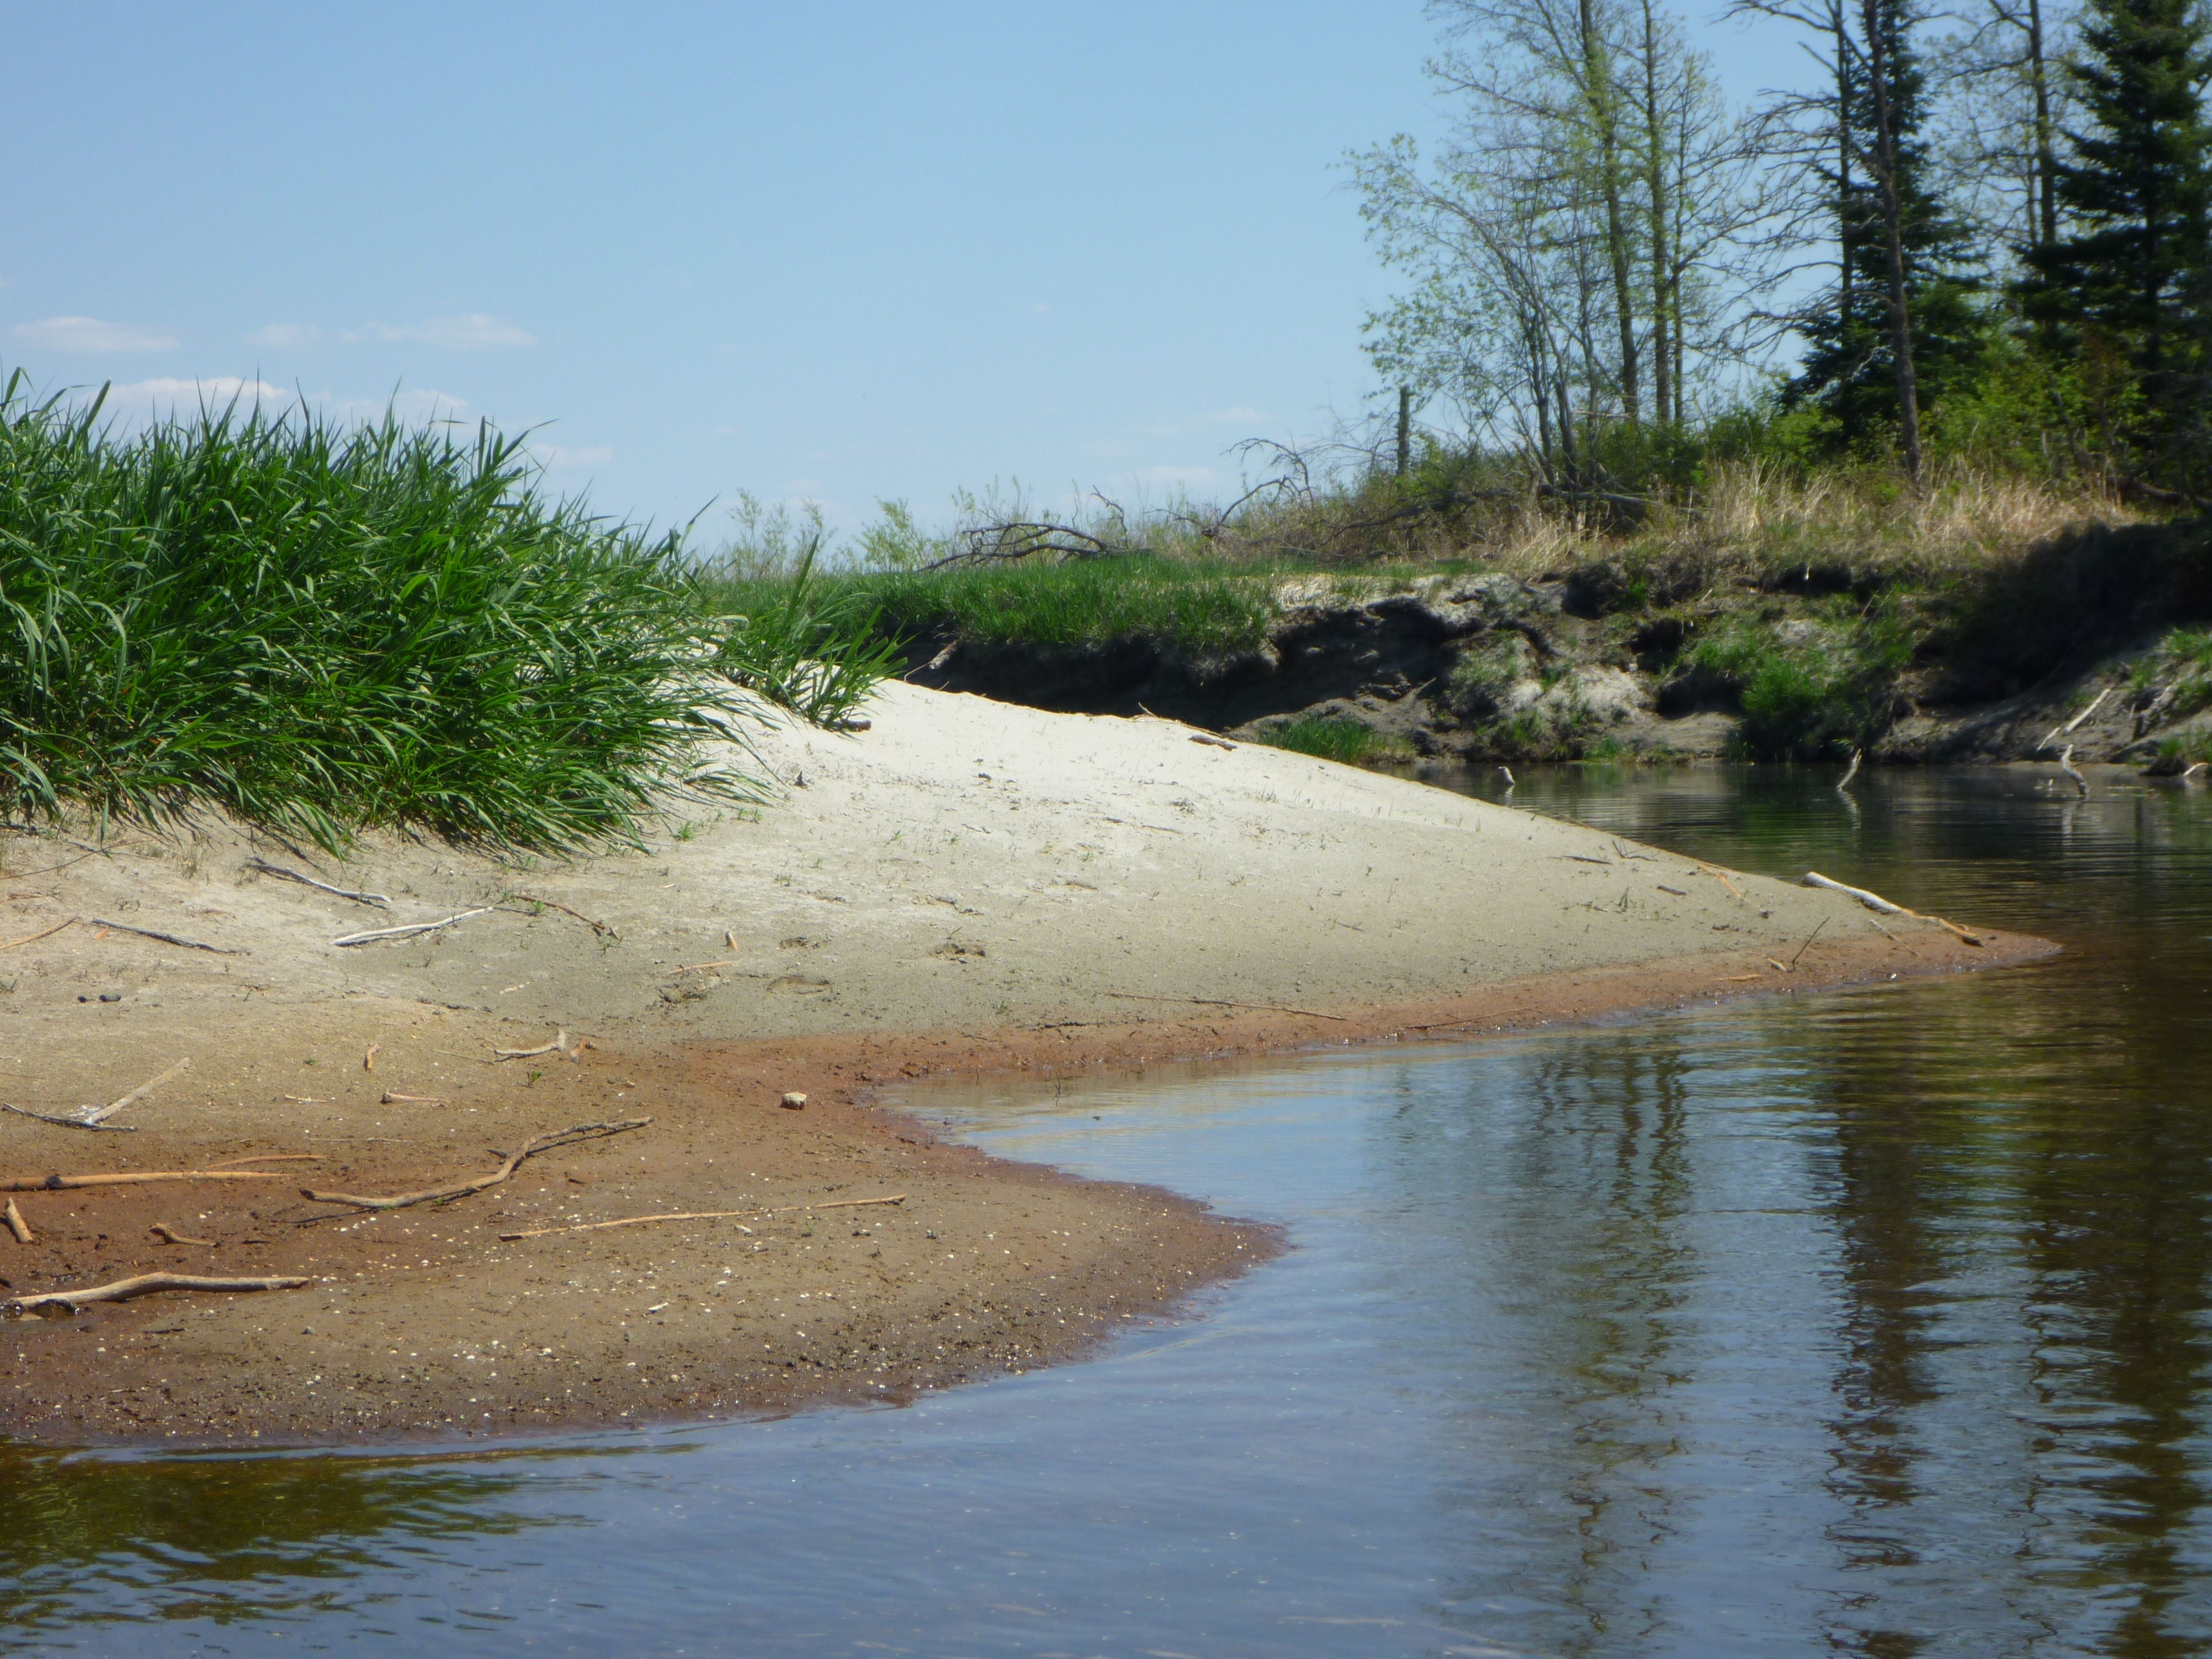 Rusty Riverbank Jpg 4000 3000 River River Bank Riverbank